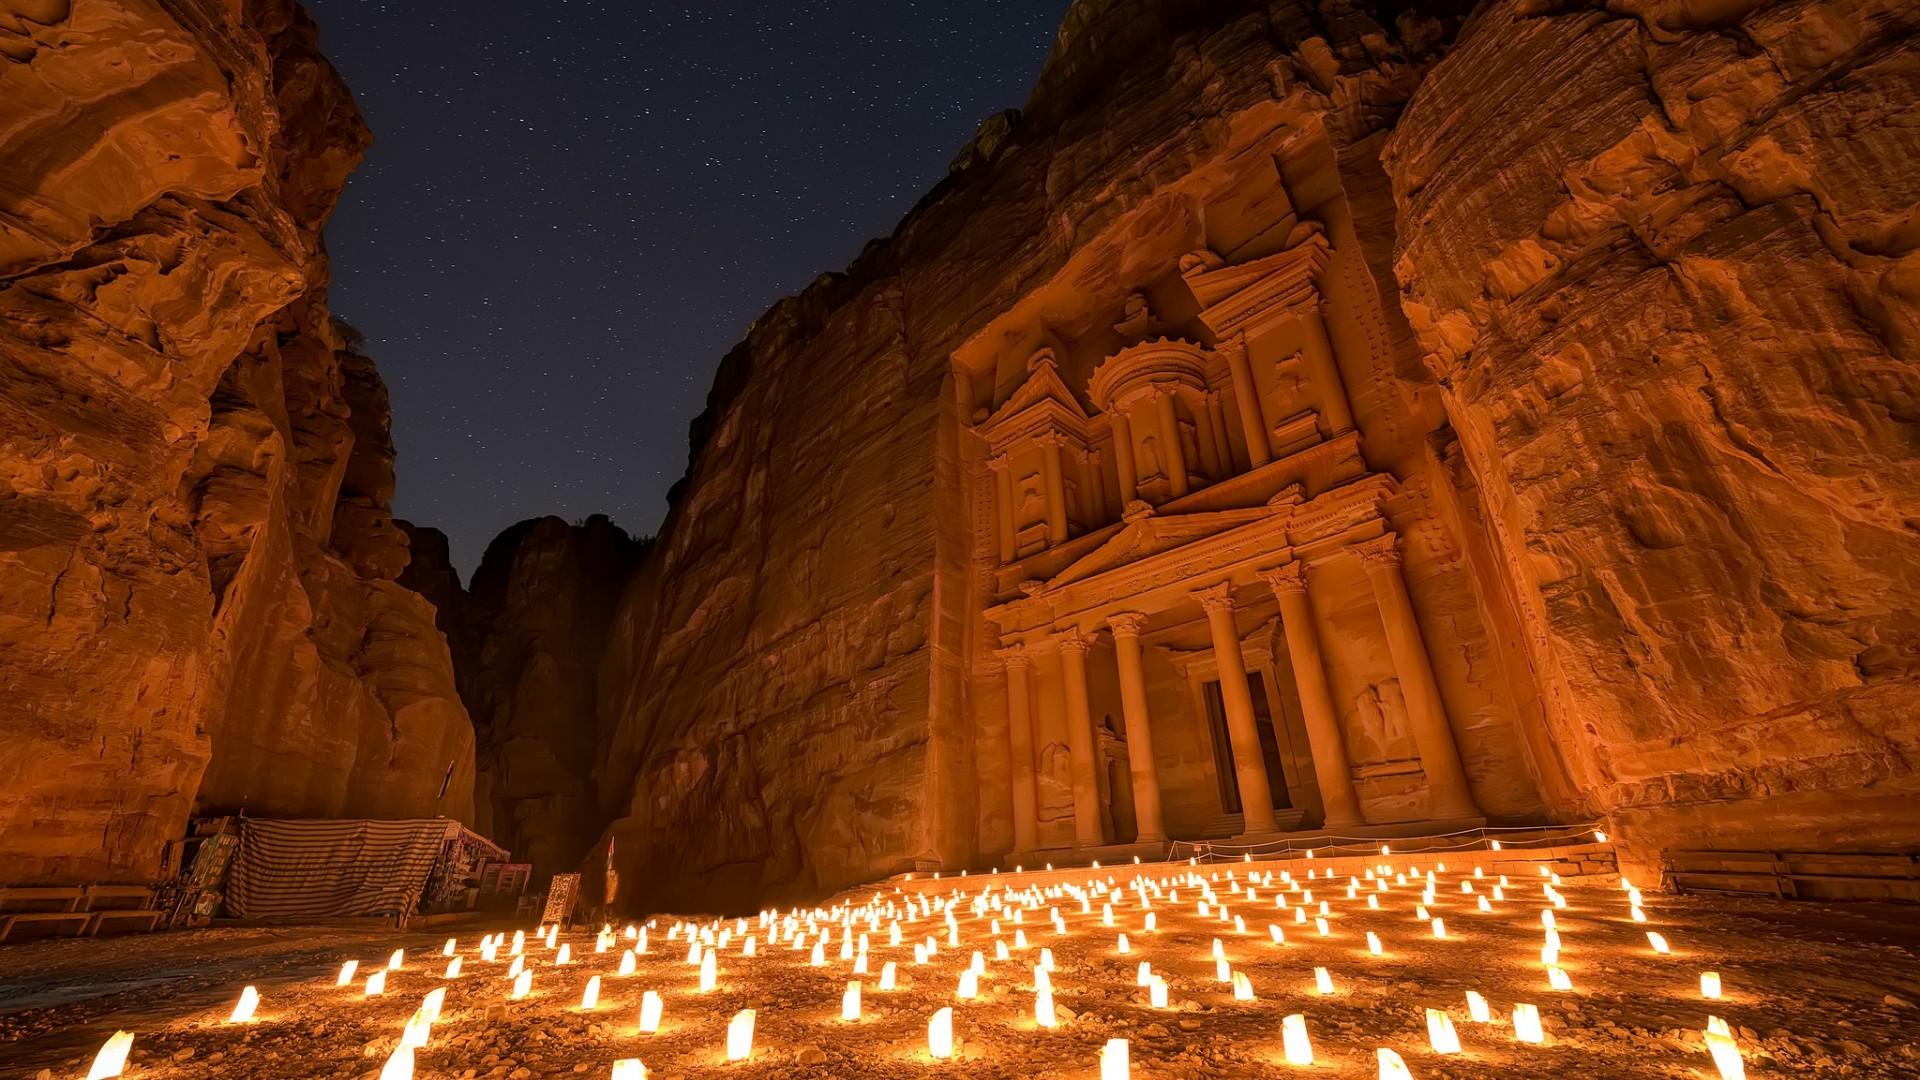 General 1920x1080 Petra ancient Jordan (country) candles rocks building